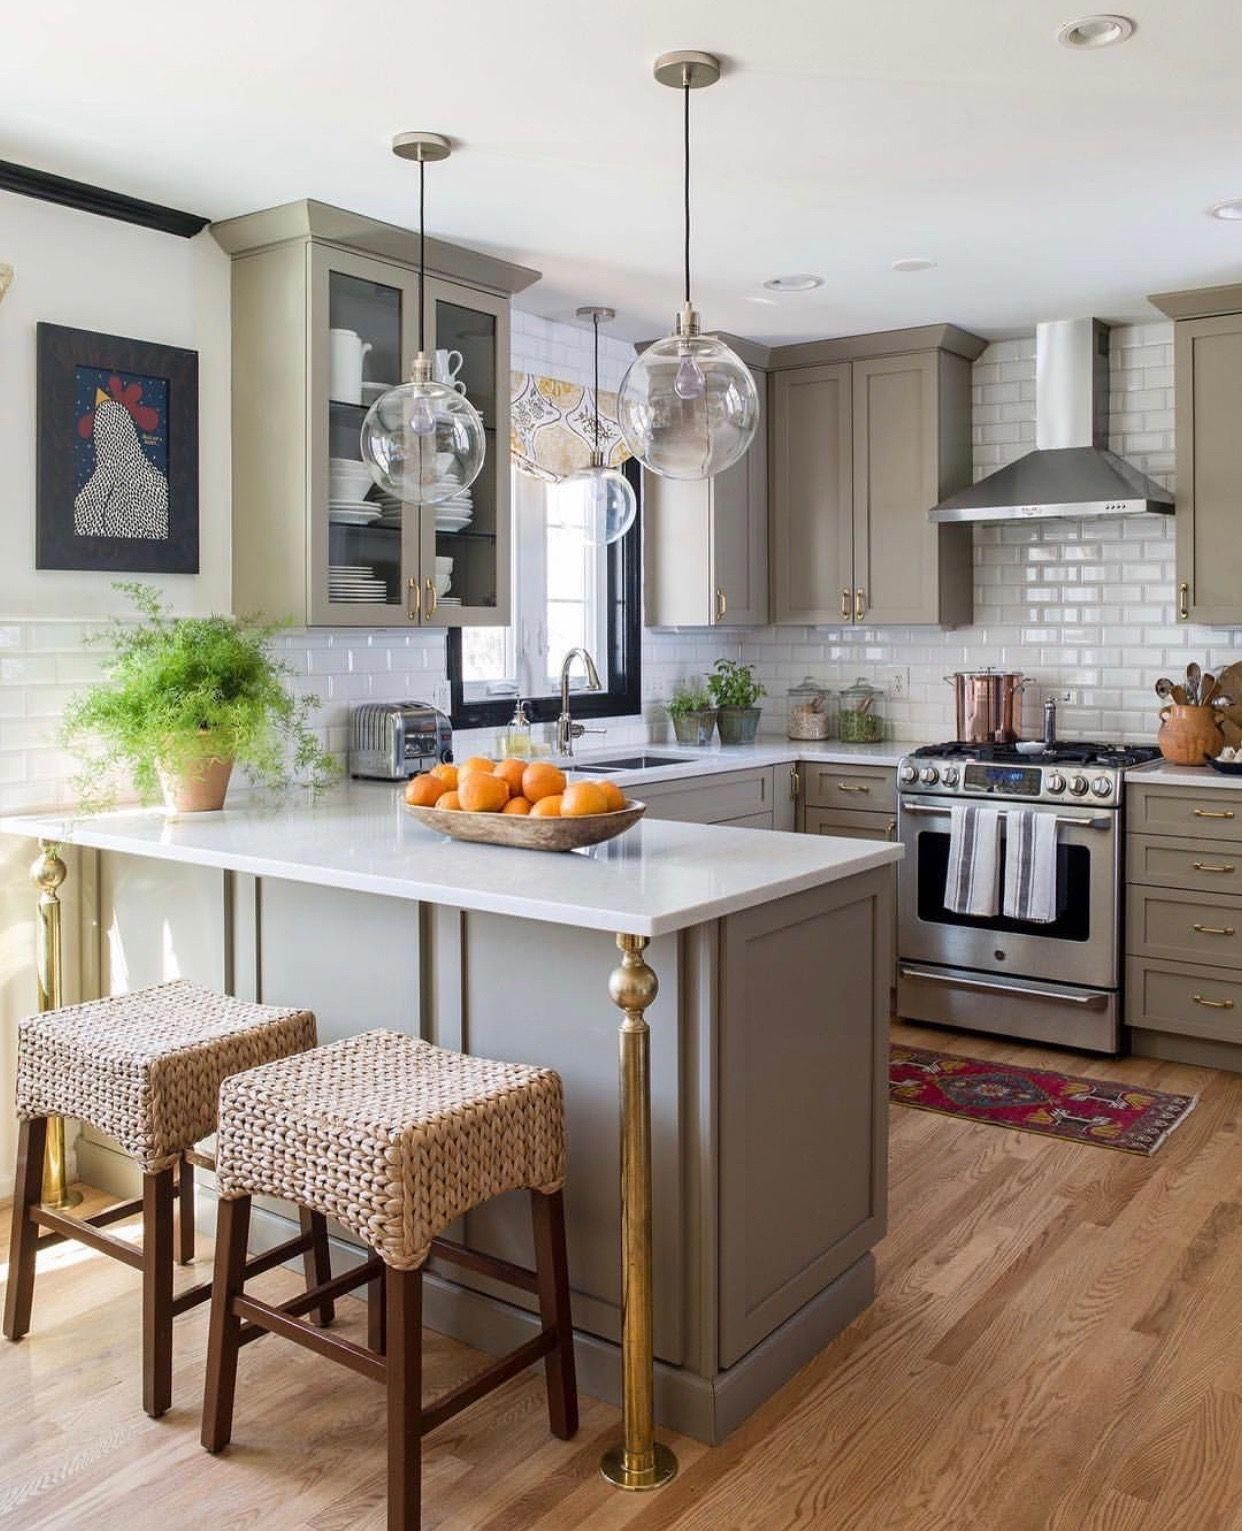 find more ideas narrow u shaped kitchen large u shaped kitchen kitchen designs layout on u kitchen ideas small id=59393